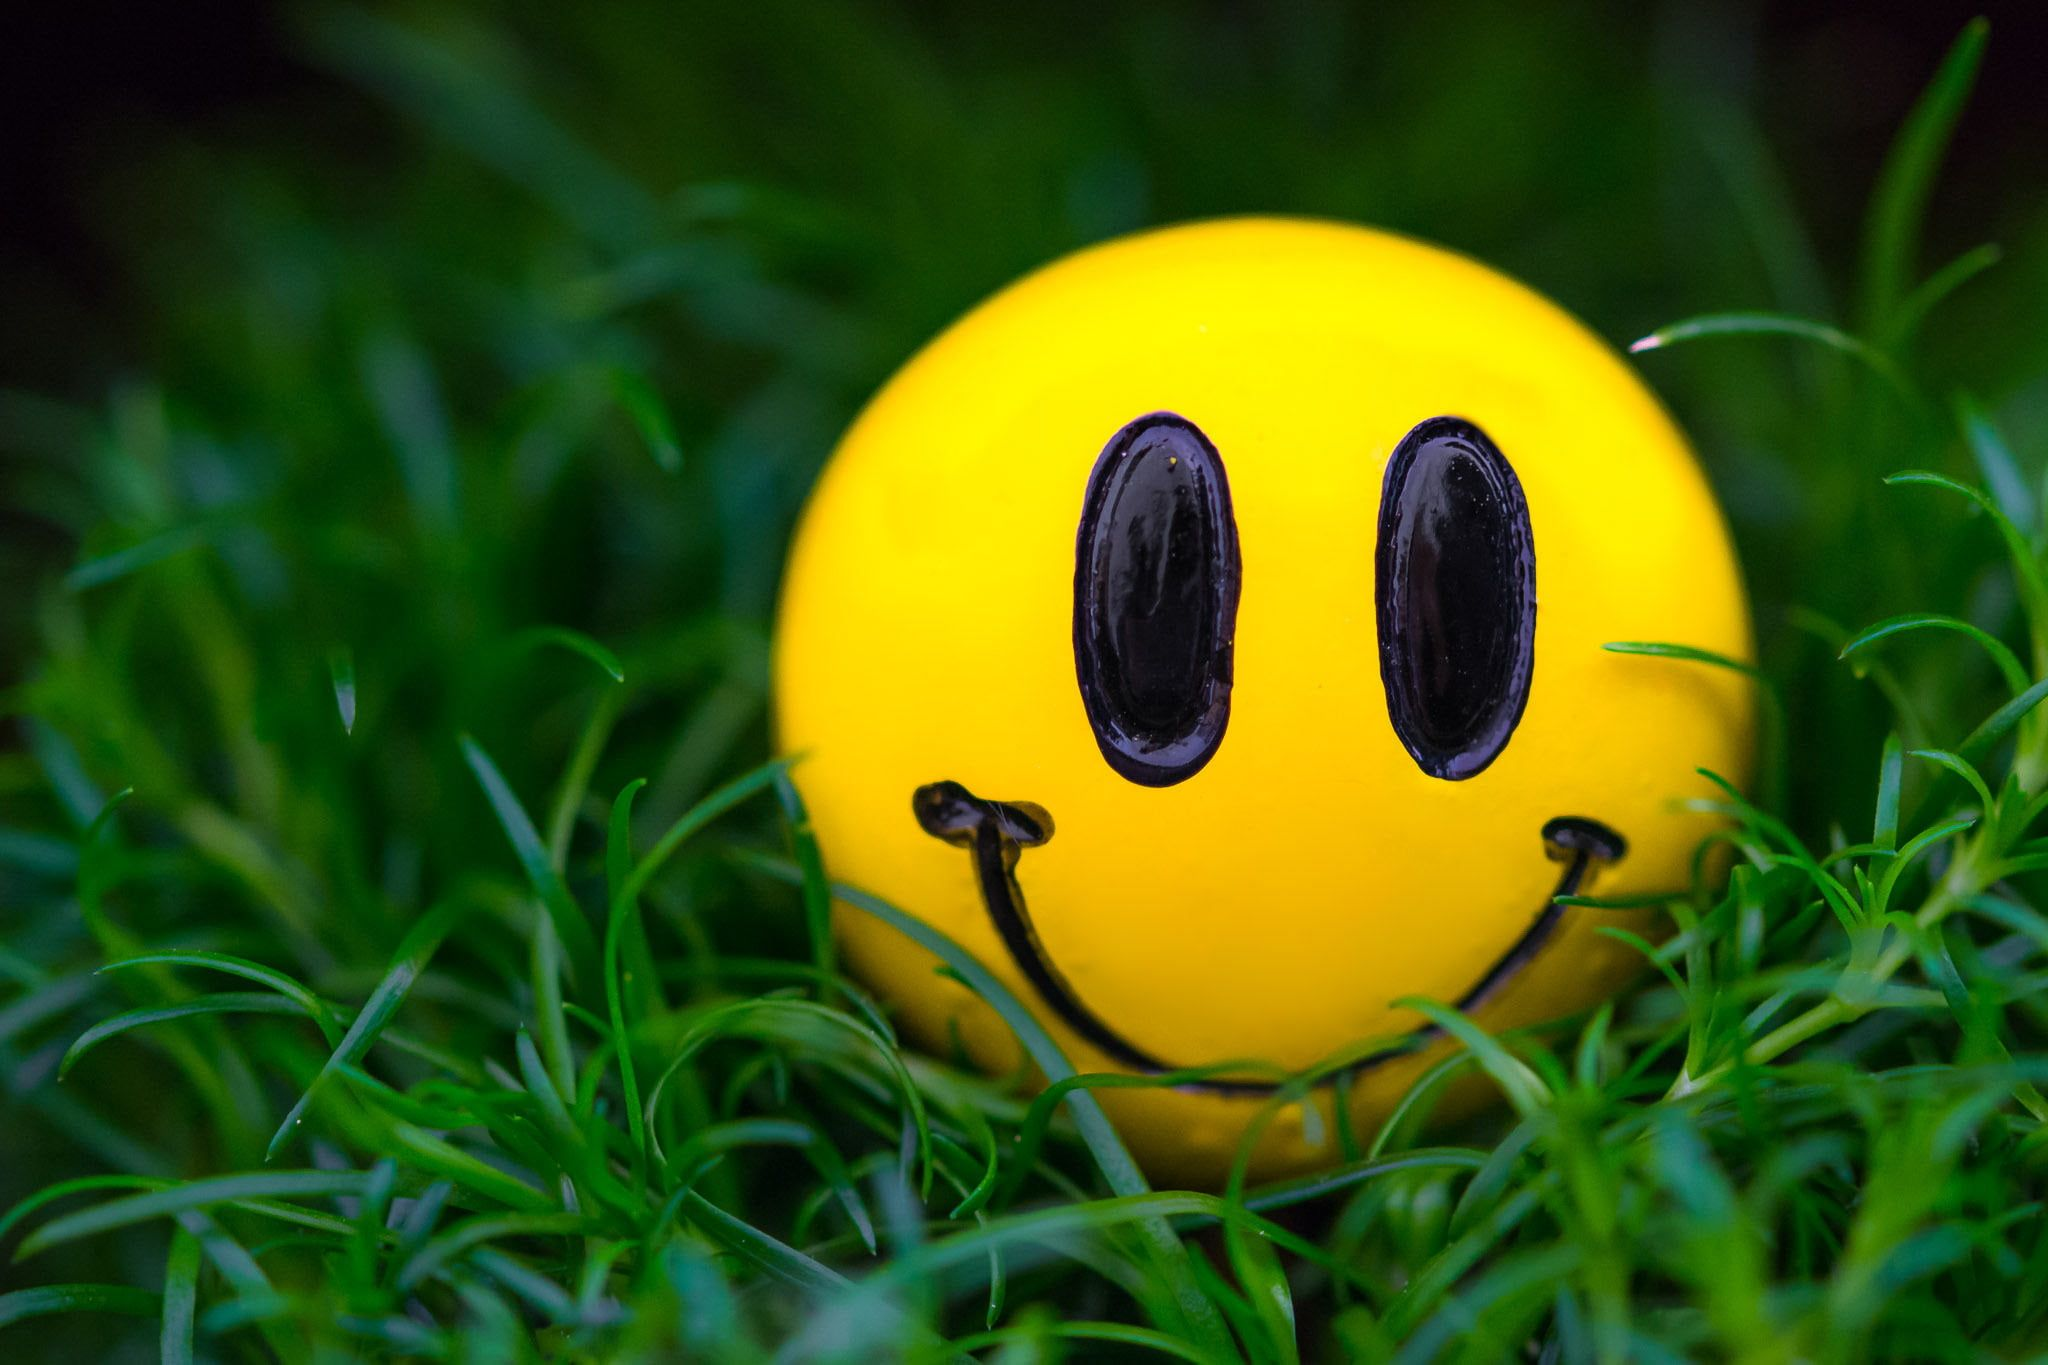 Sad Emoji Wallpaper Hd 1080p - Wallpaper HD New